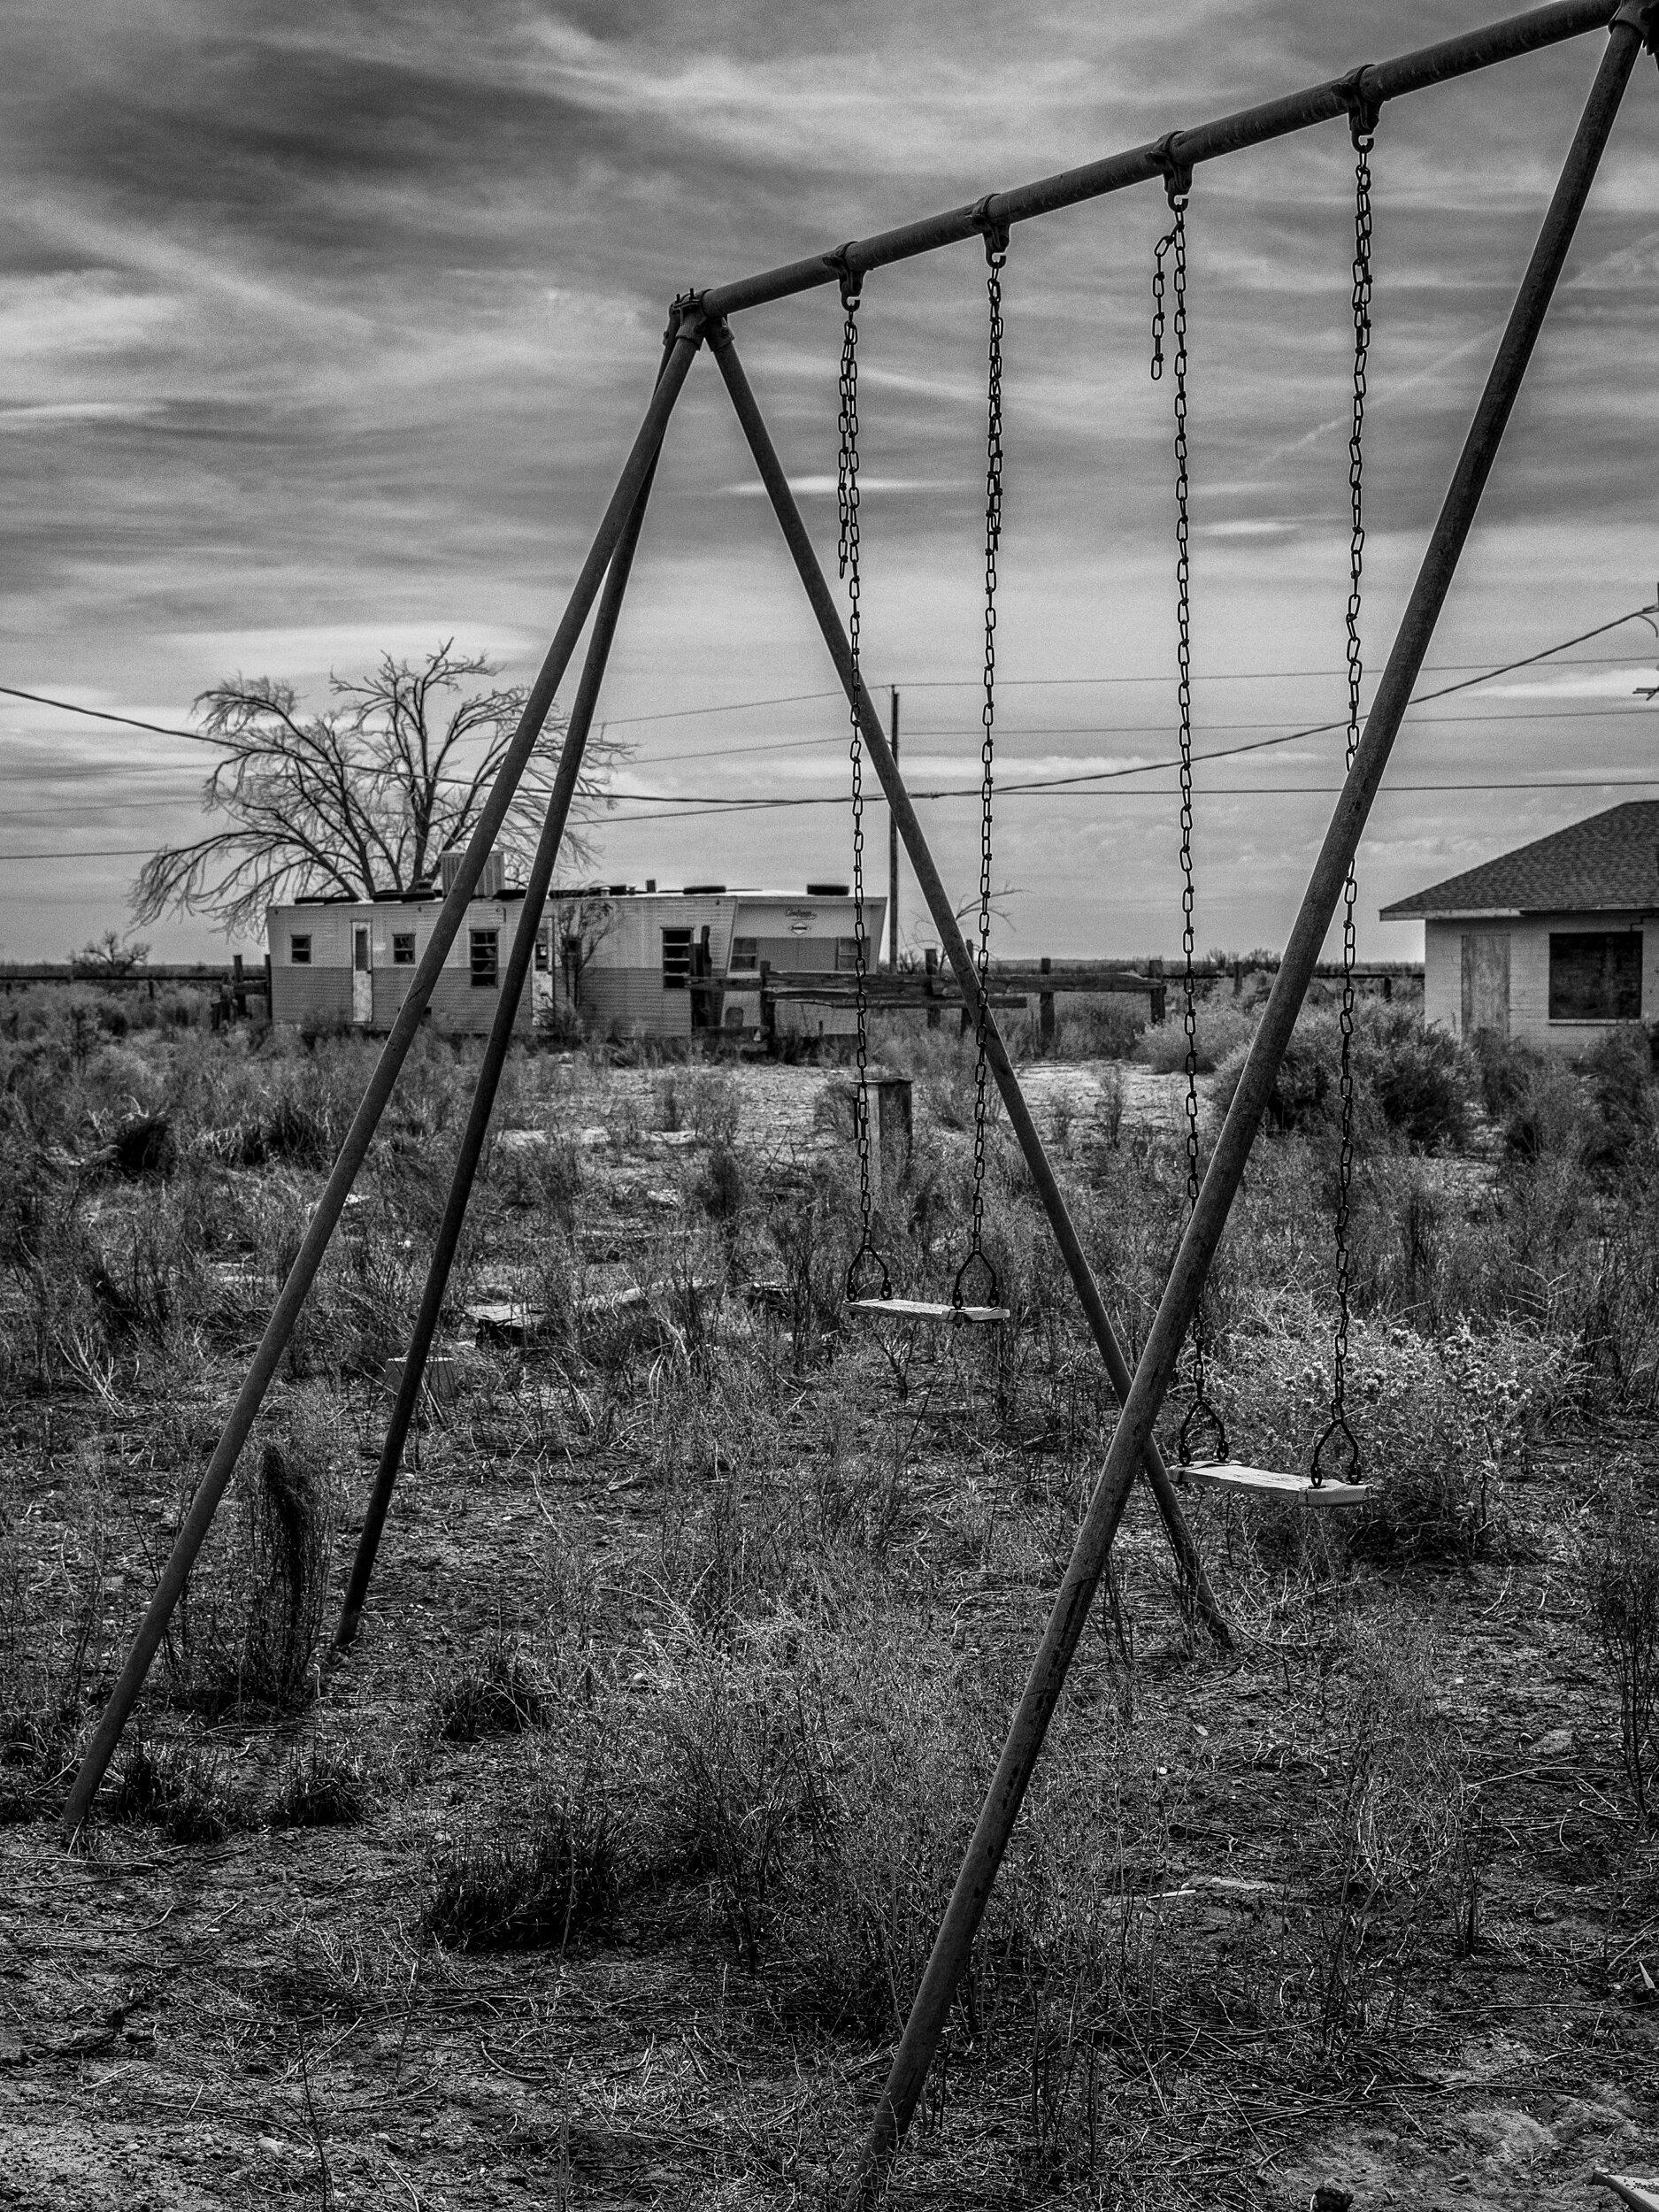 Route 66, Jackrabbit, Arizona